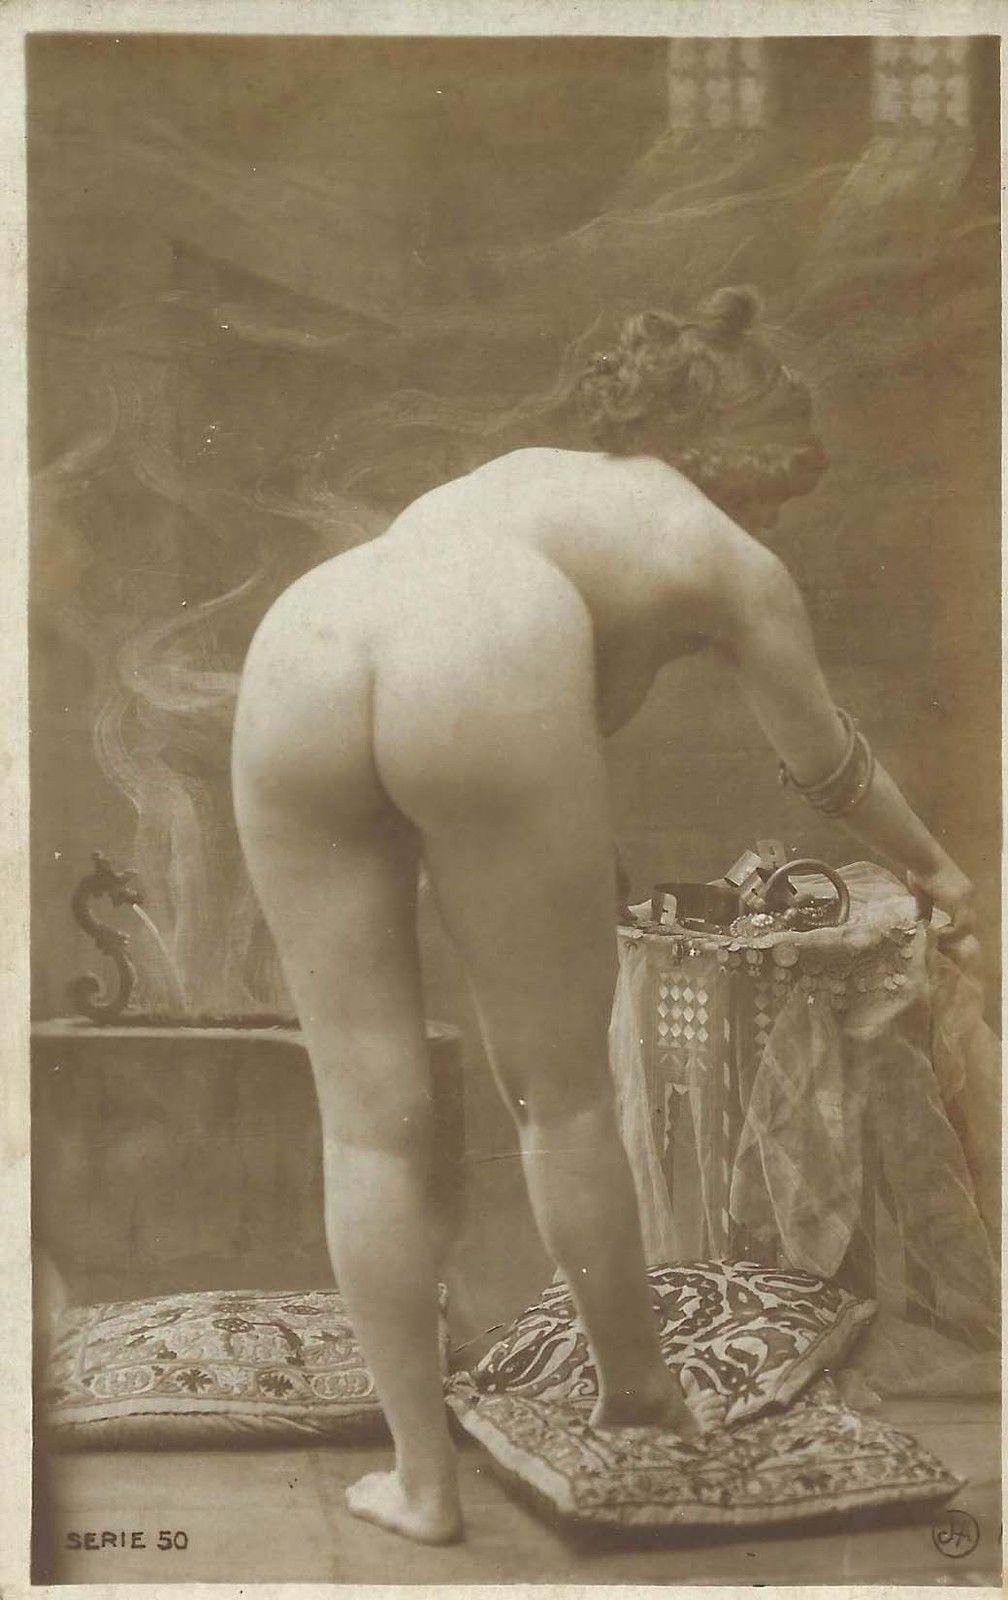 Young nude koria teets